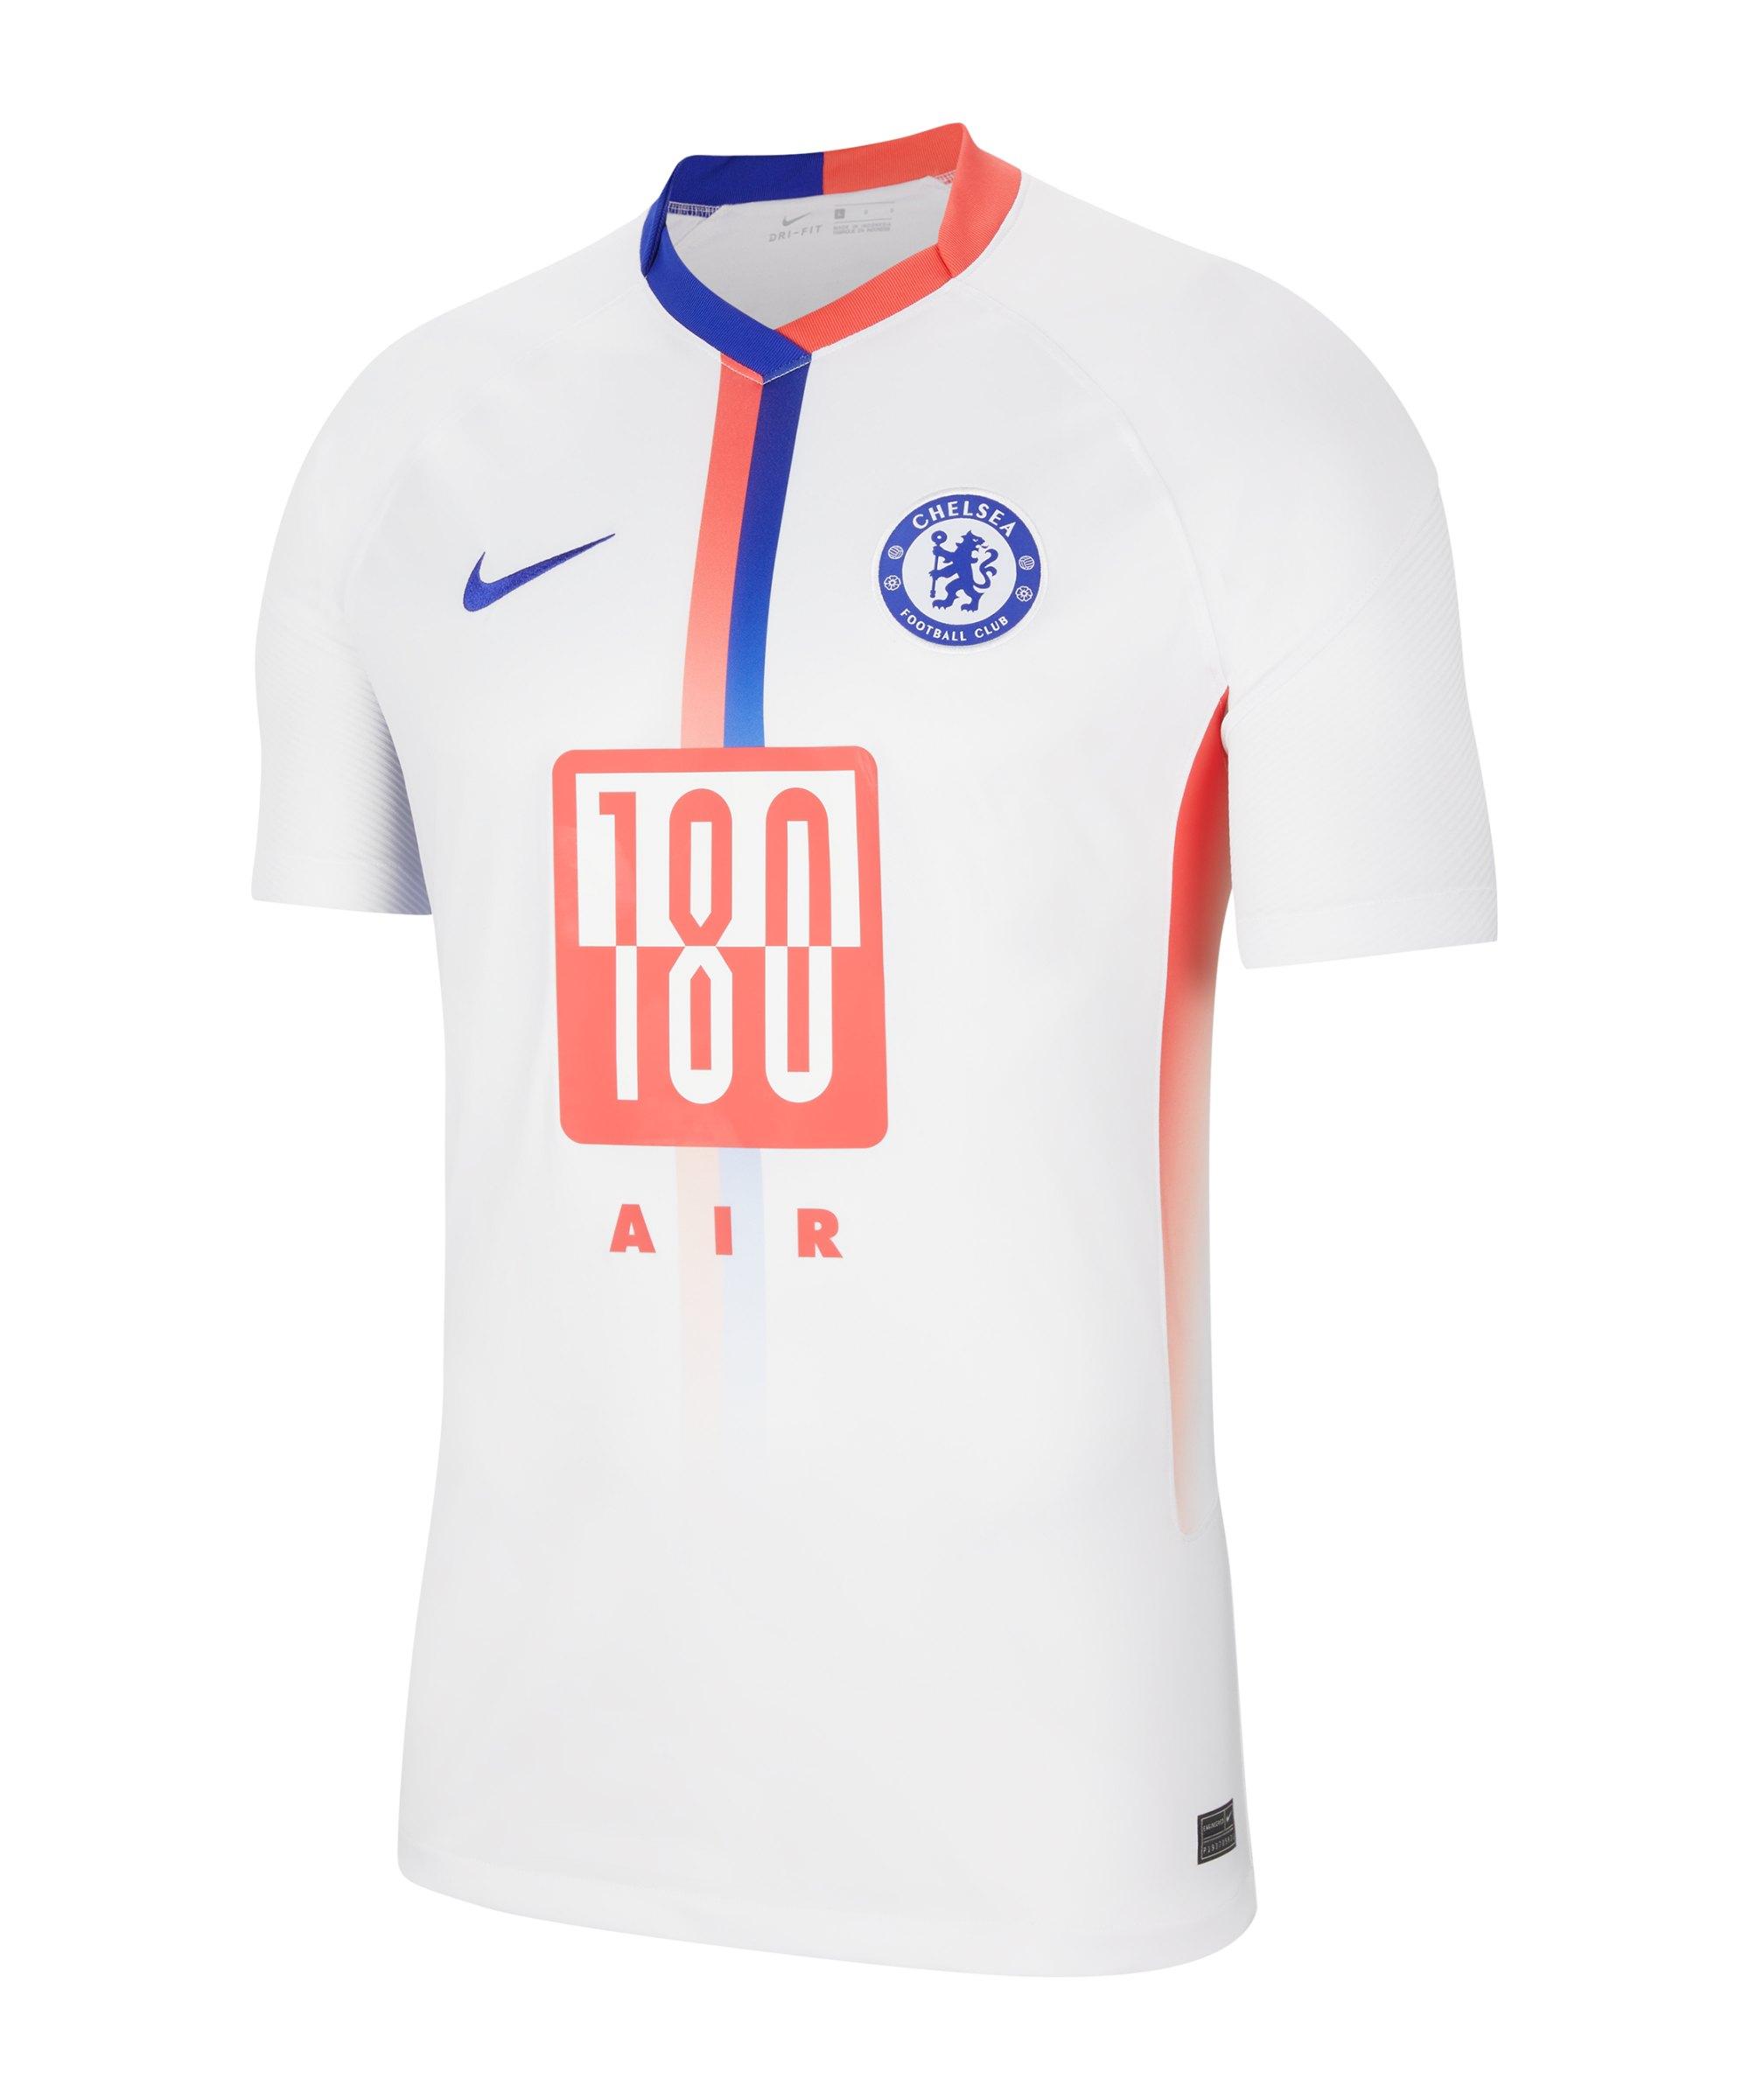 Nike FC Chelsea London Air Max Trikot 2020/2021 Weiss F101 - weiss